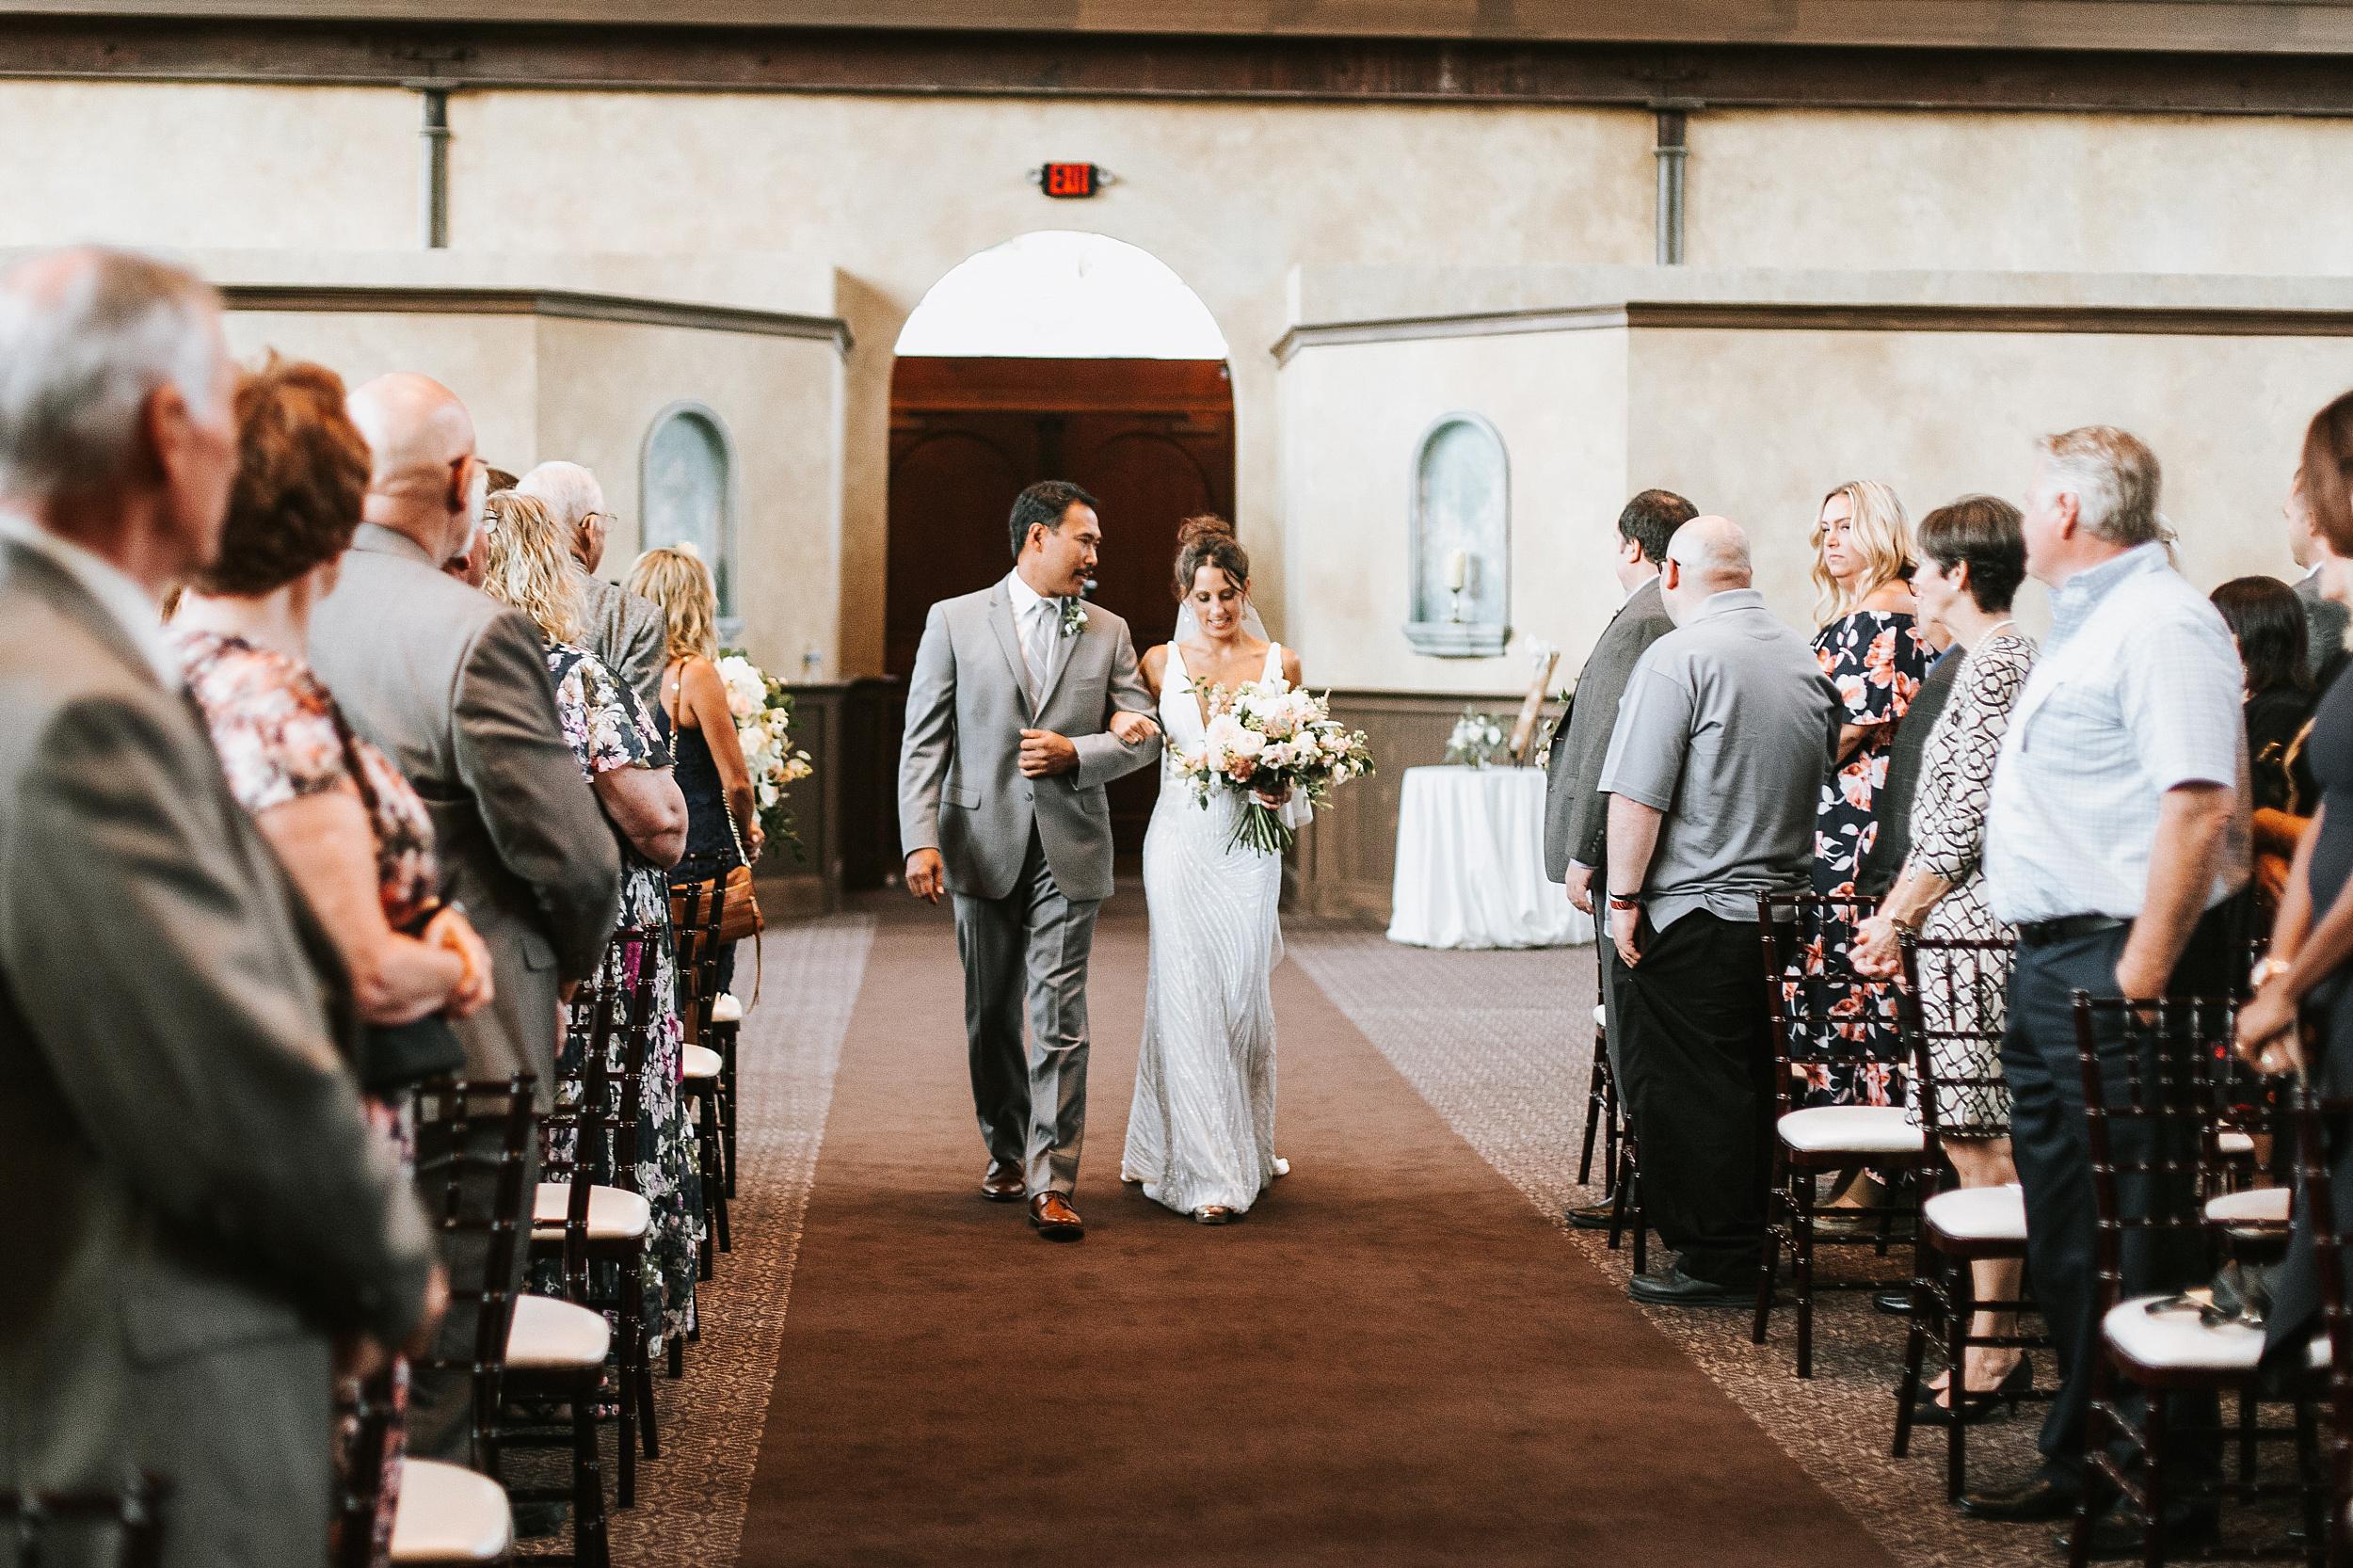 Brooke Townsend Photography - Cincinnati Wedding Photographer (108 of 170).jpg